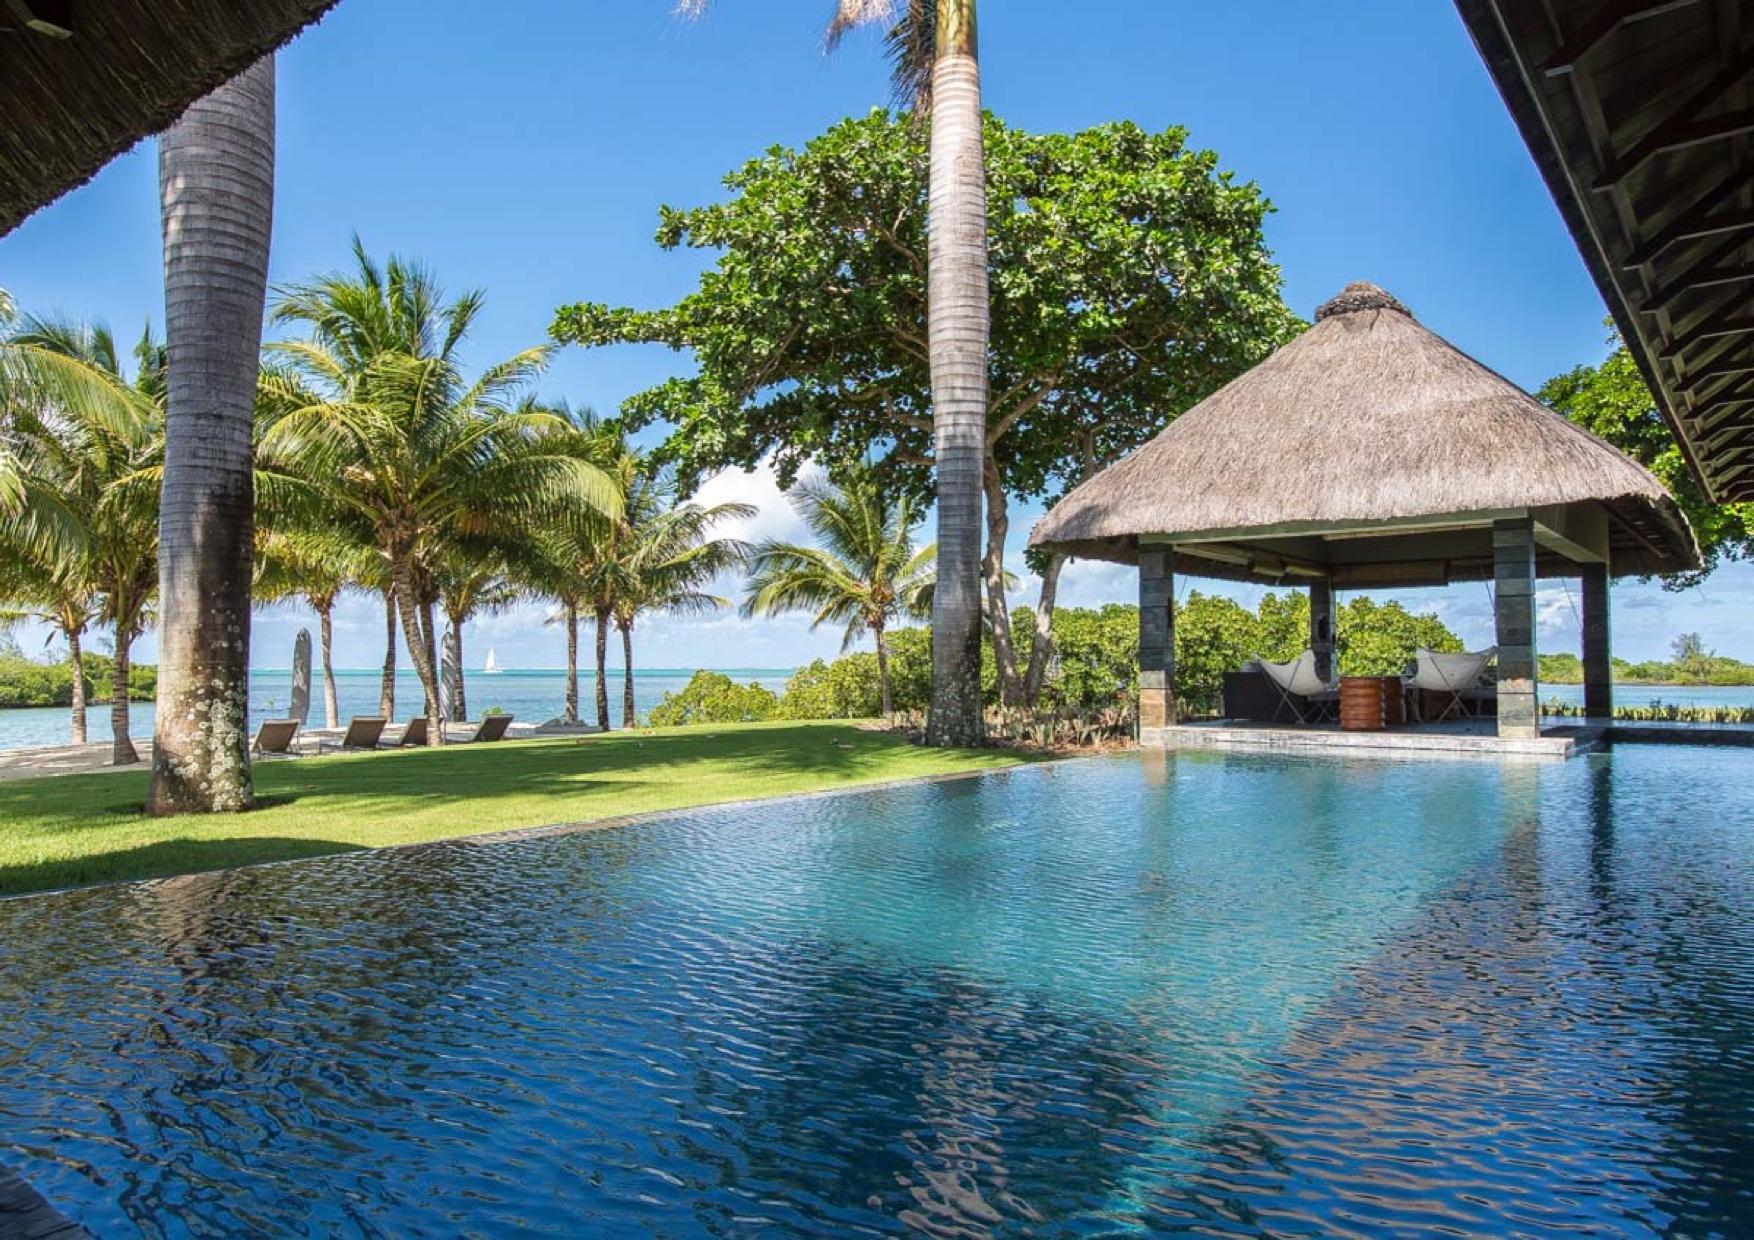 www.immobilier-swiss.ch|||Four Seasons Luxury Villa Complexe Anahita Mauritius|||||||||||||||||||||||||||||magnifique domaine résidentiel d'Anahita